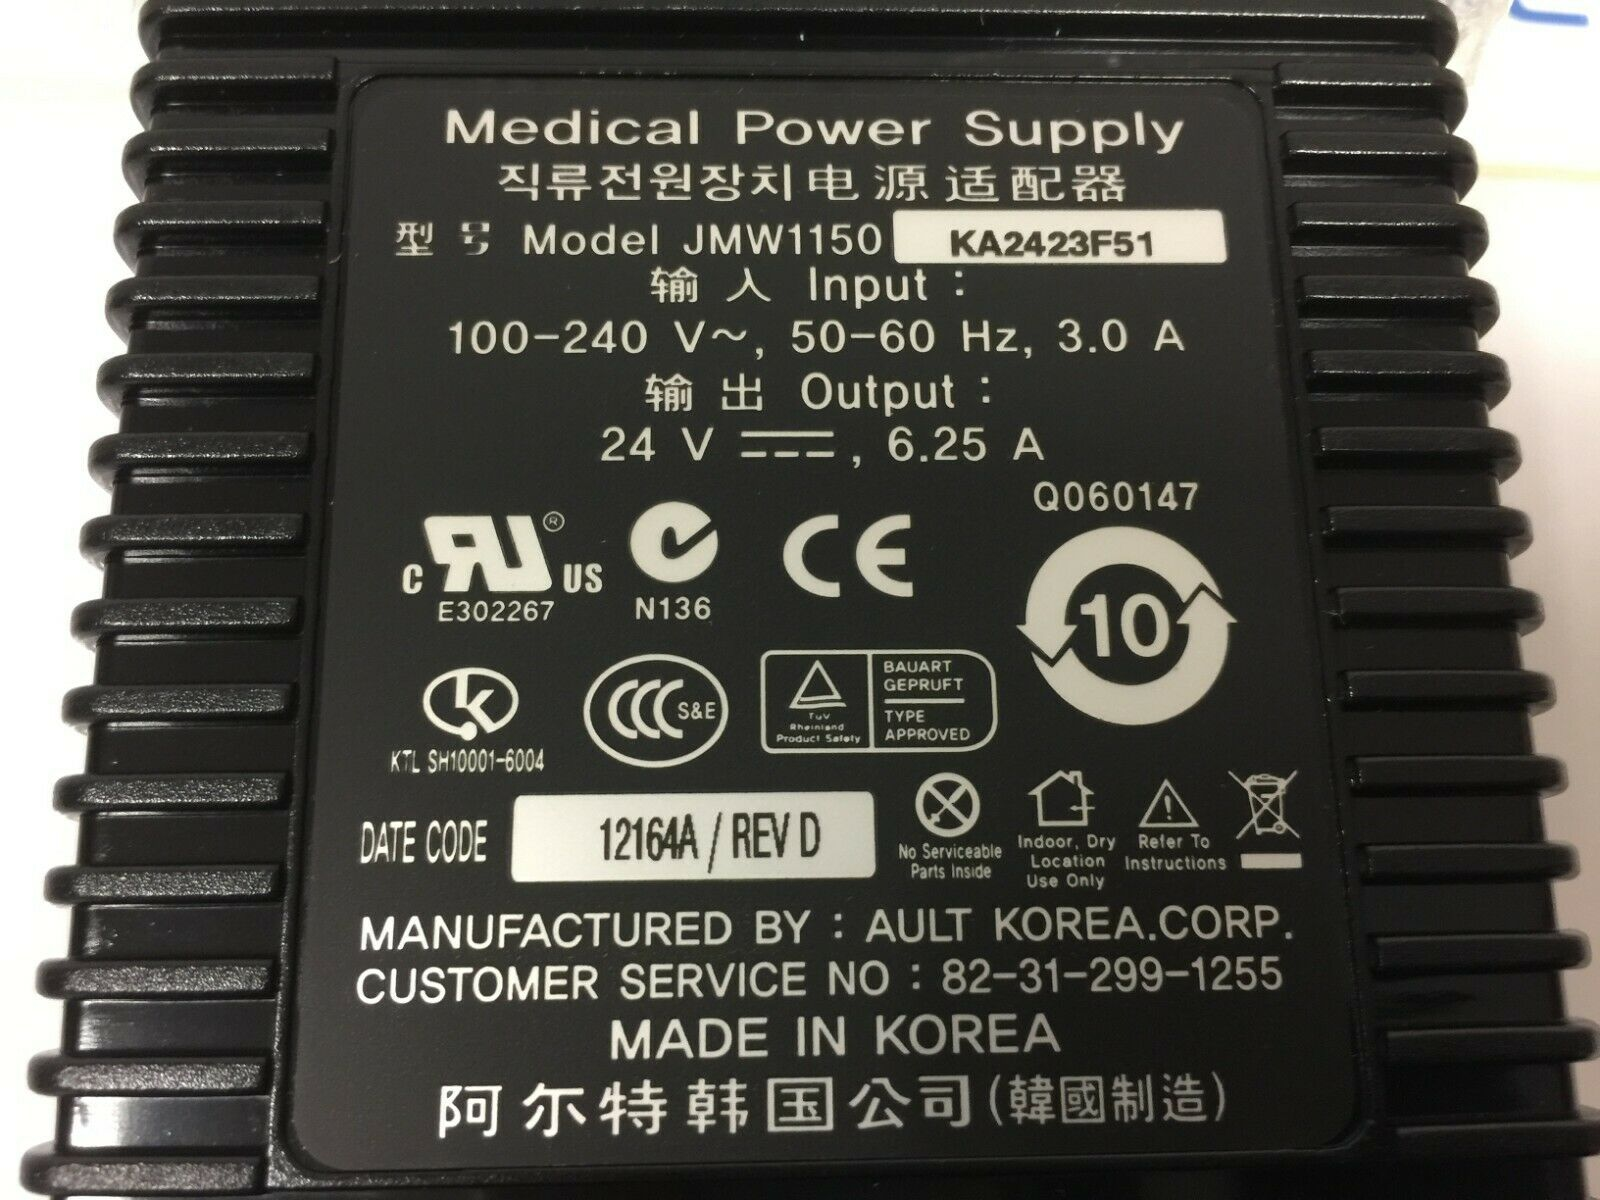 NDS AULT JMW1150KA2423F51 8-pin Medical Power Supply 24V 6.25A NIB*